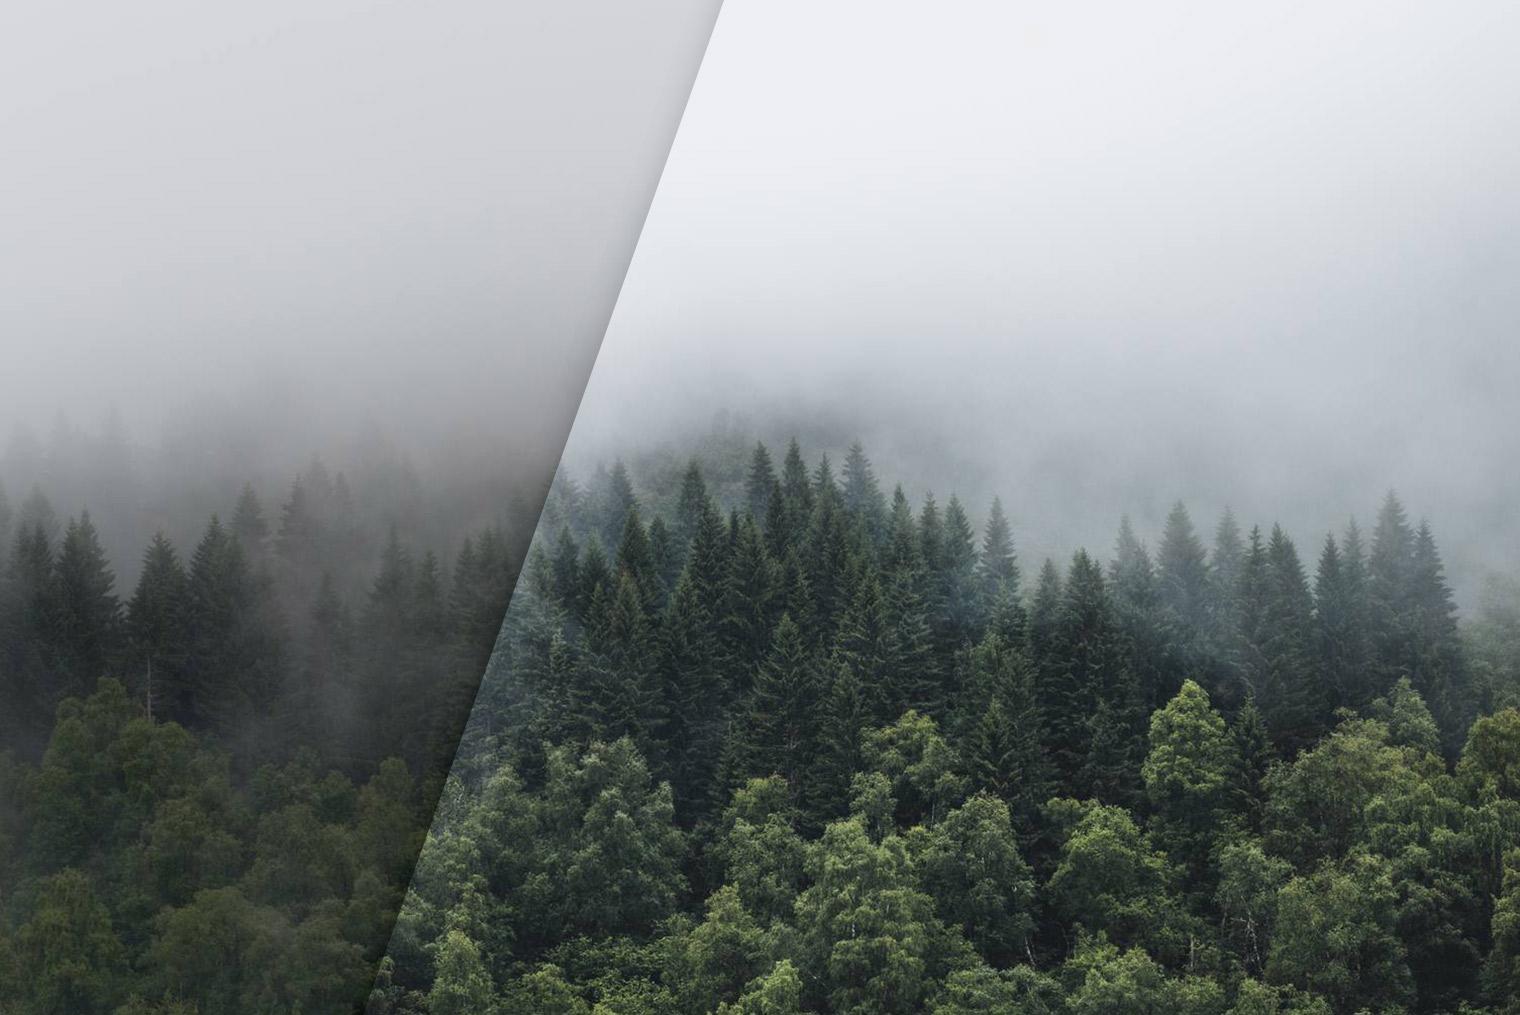 nls-free-moody-landscape-lightroom-presets-before-after-07